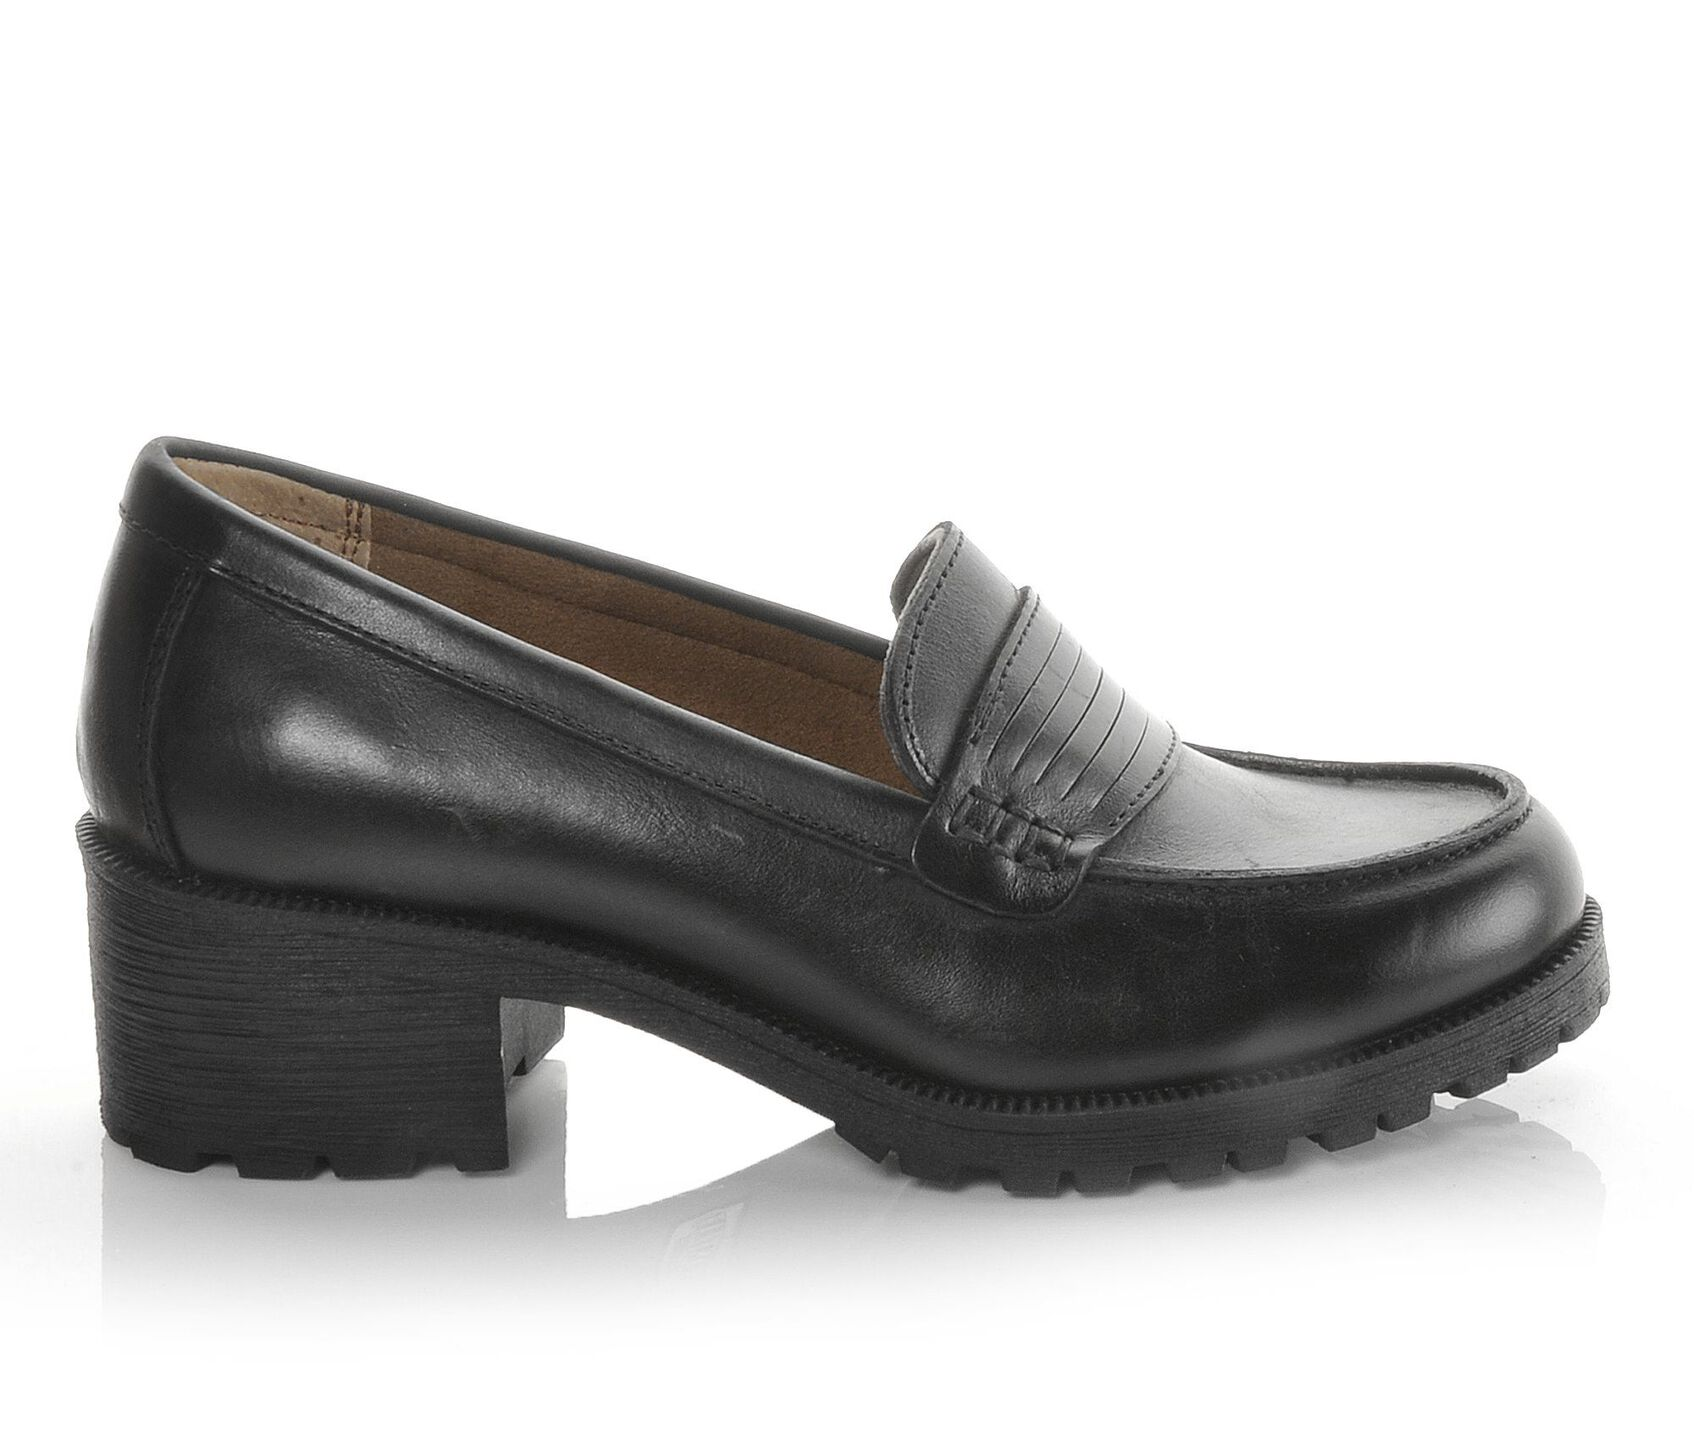 ea1fdde579c ... Eastland Newbury Heeled Penny Loafers. Previous